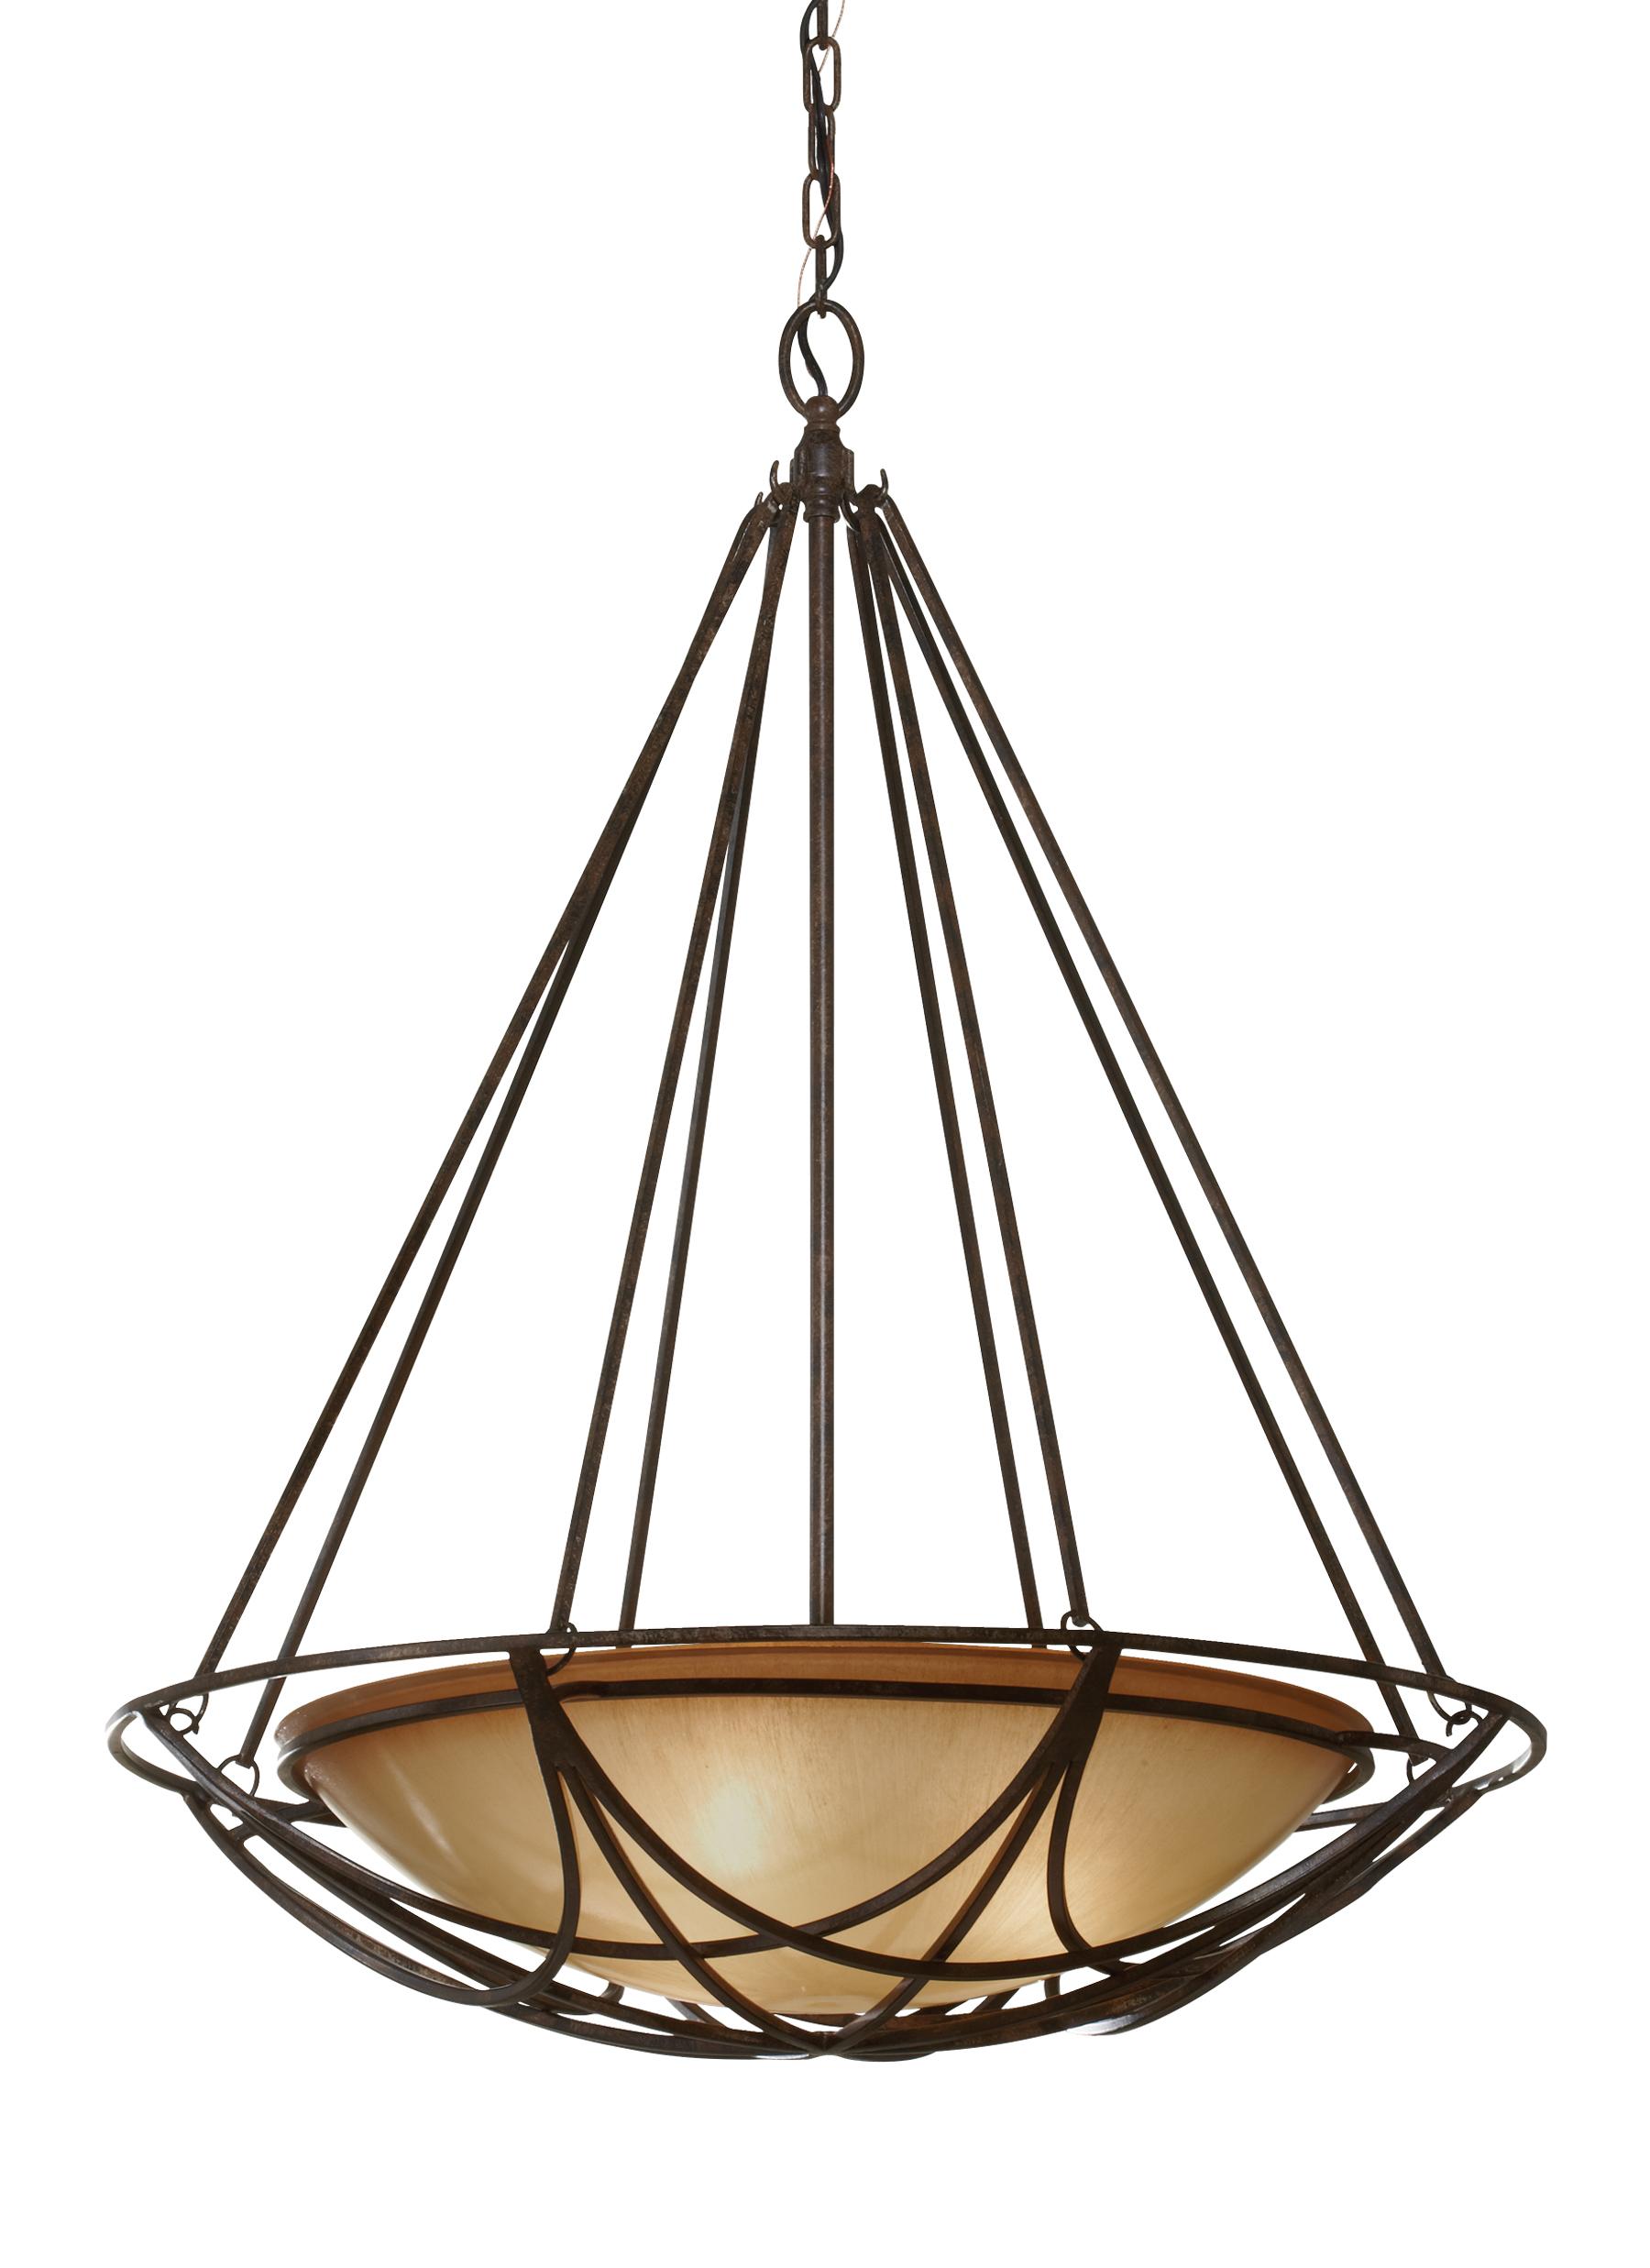 f2607 3mbz 3 light uplight chandelier mocha bronze